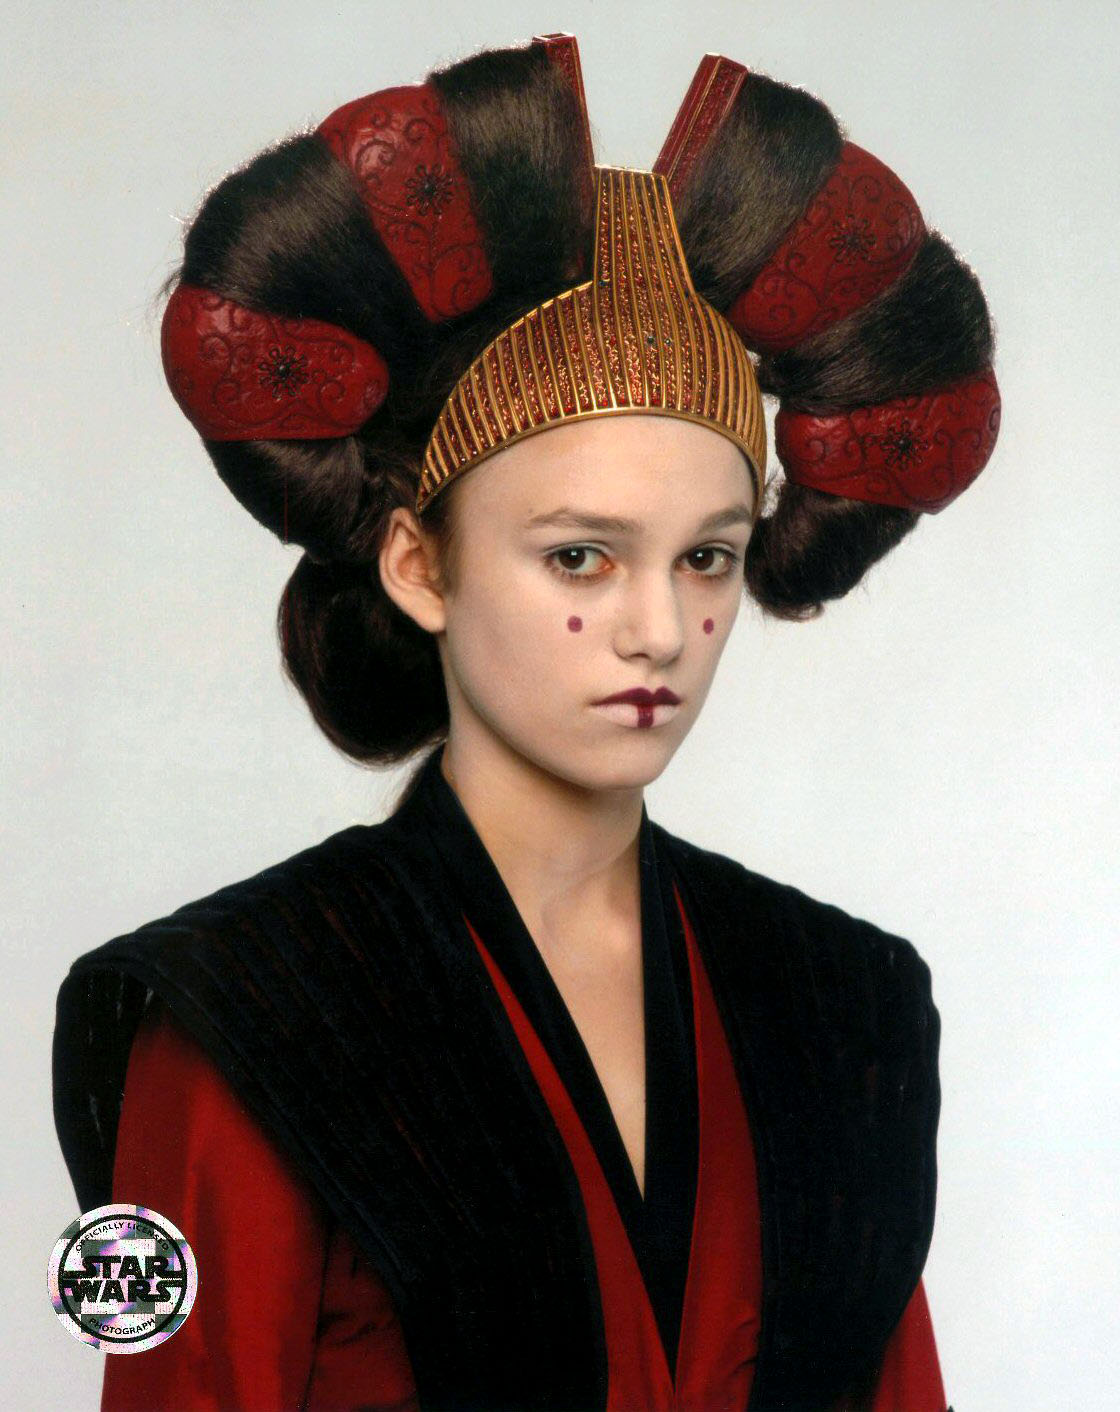 Star Wars Keira Knightley